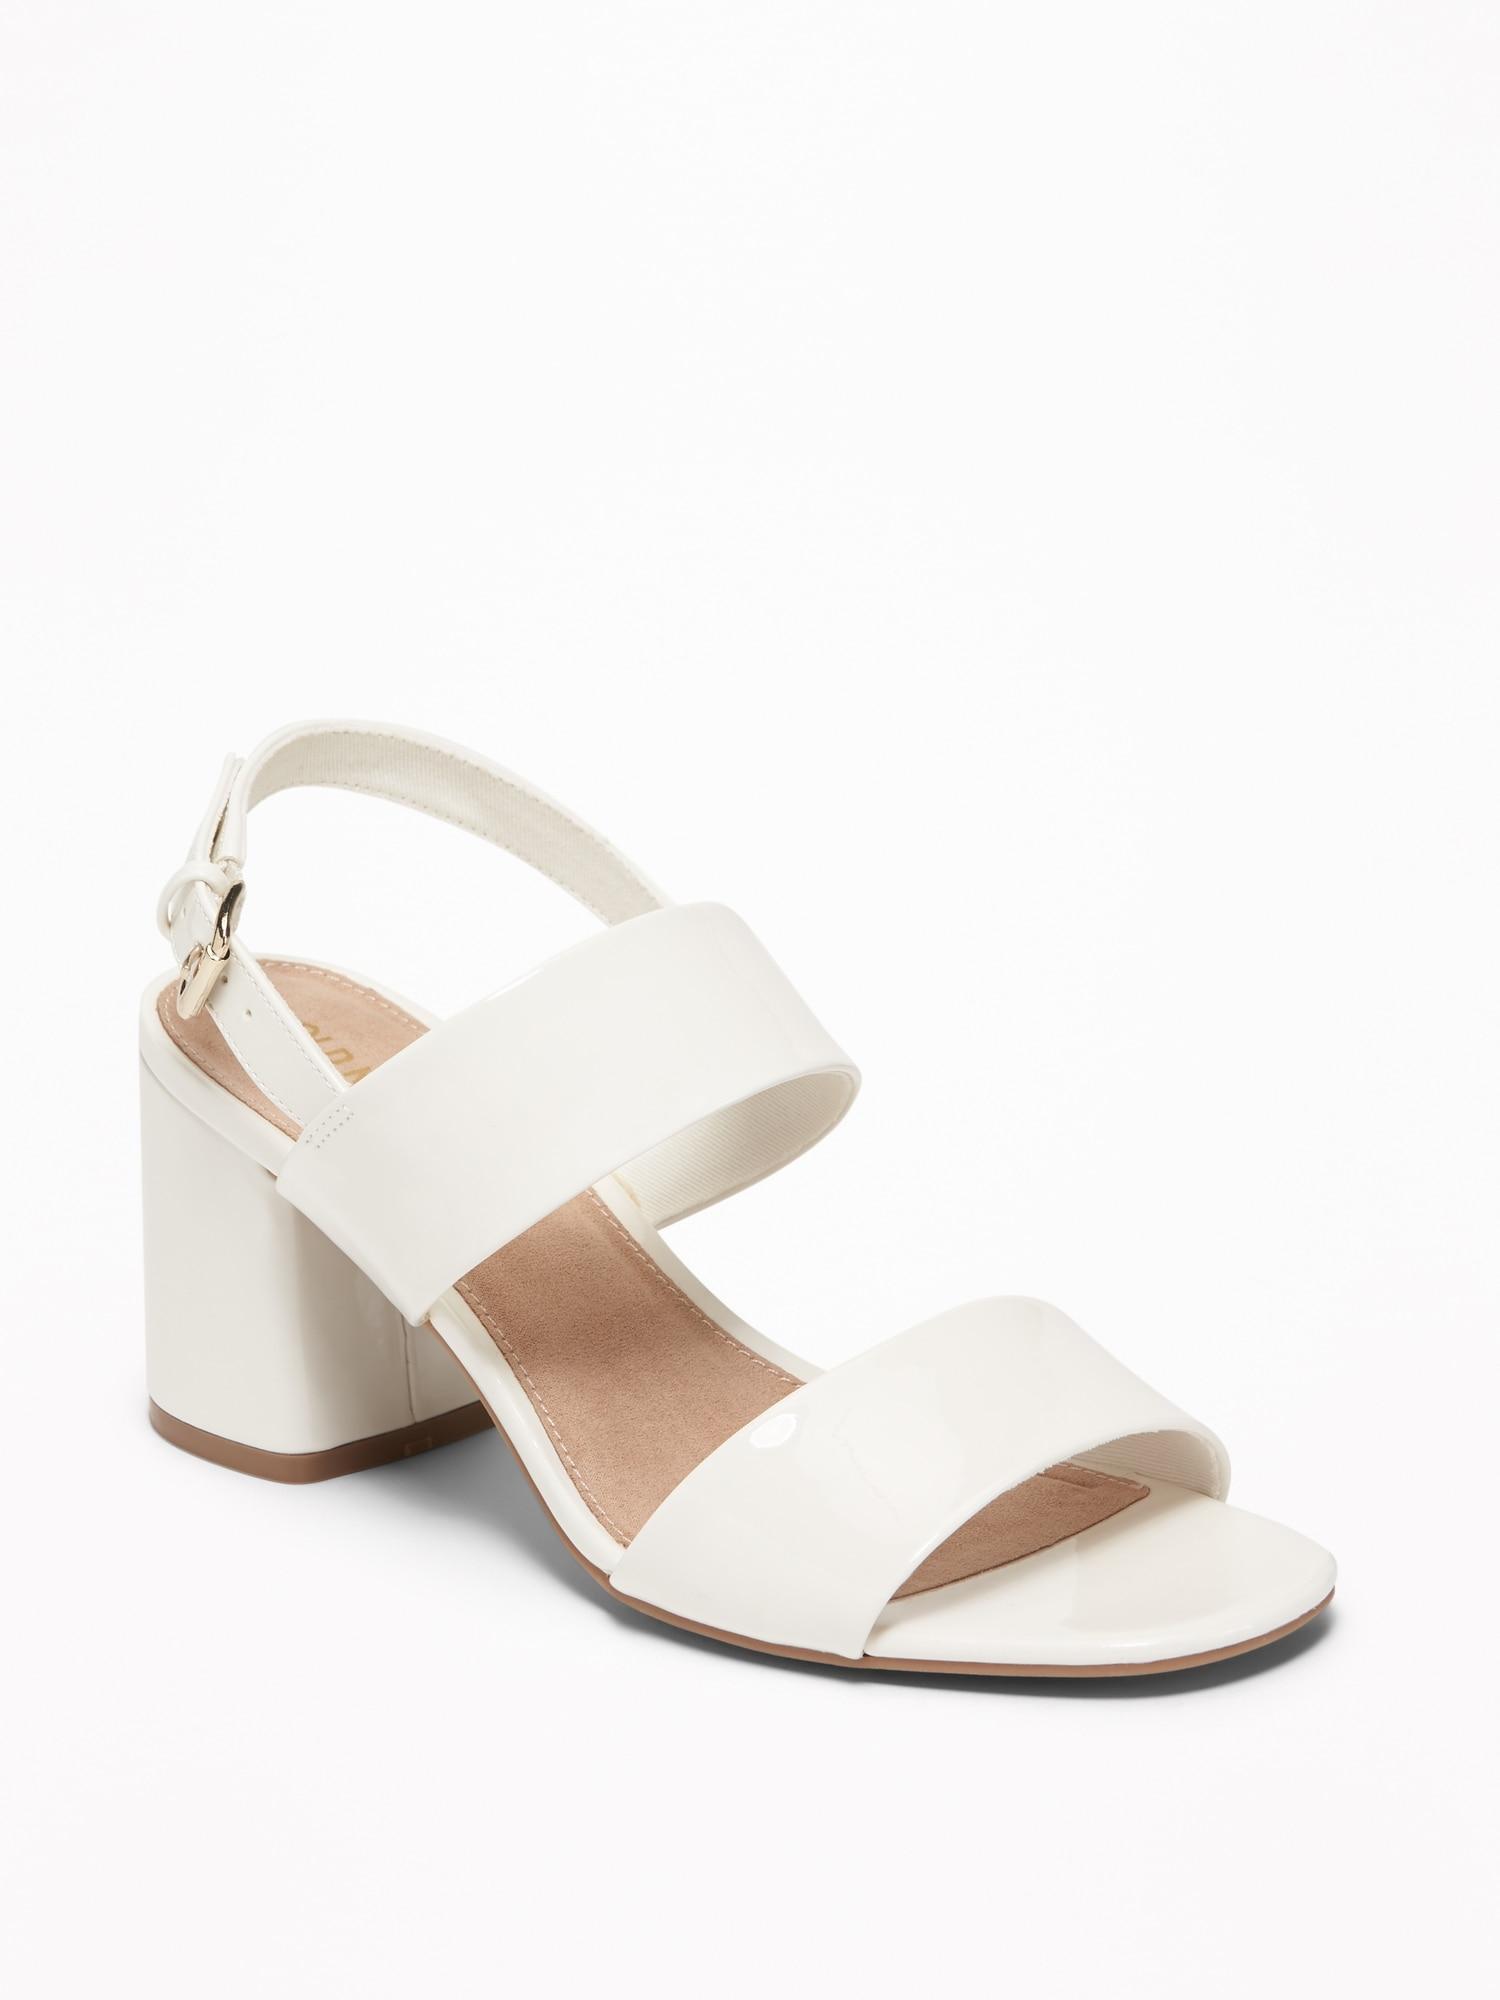 2f2cc7e19525fd Faux-Leather Slingback Block-Heel Sandals for Women